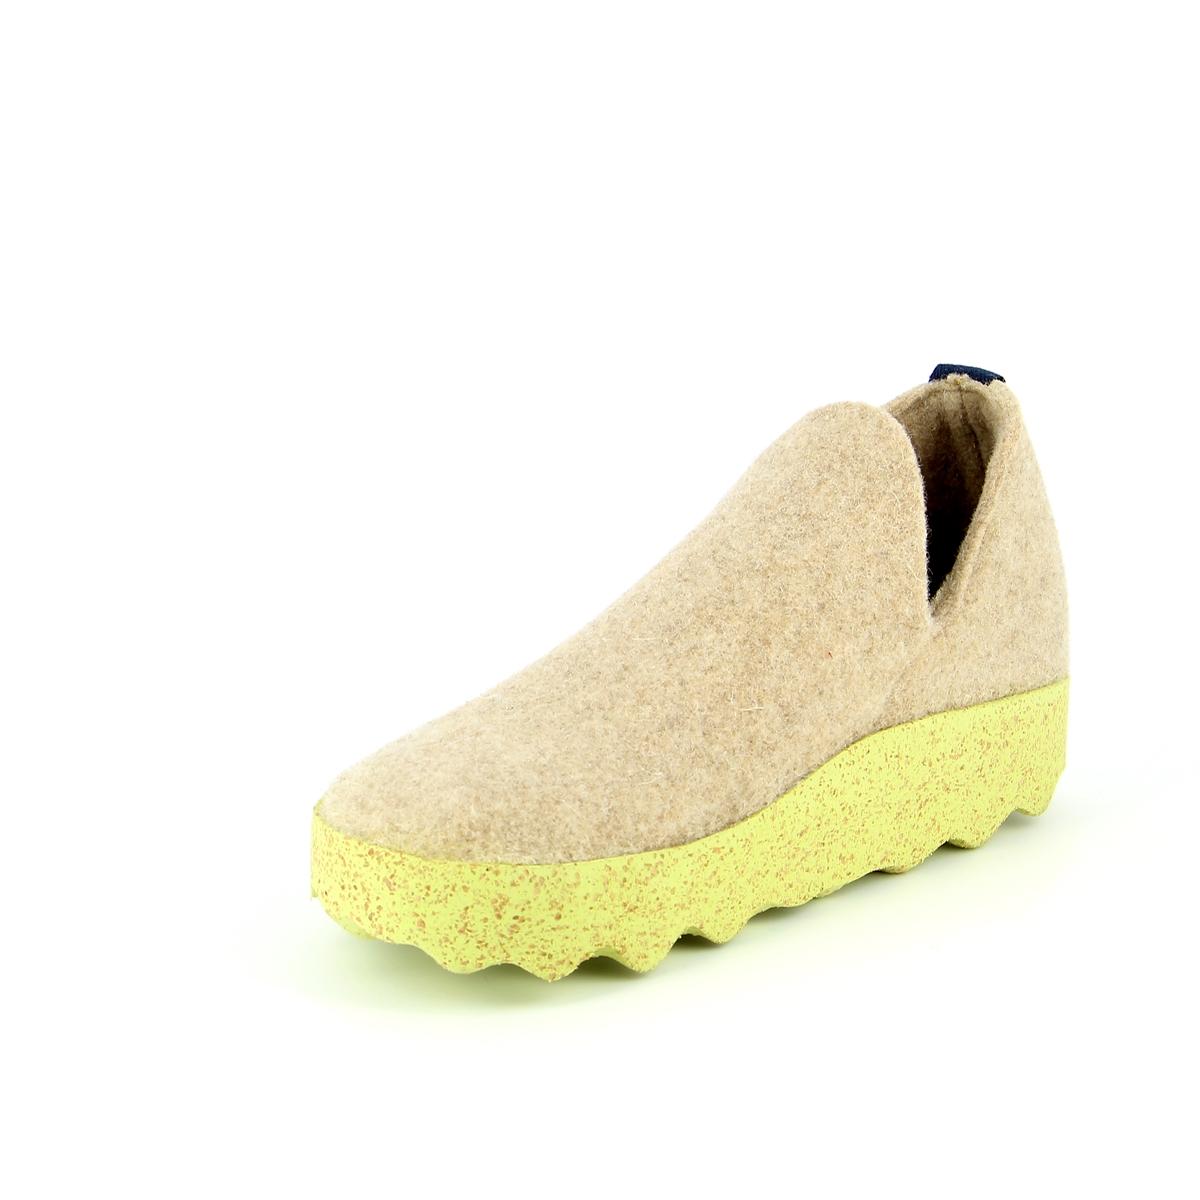 Asportuguesas Pantoffels beige